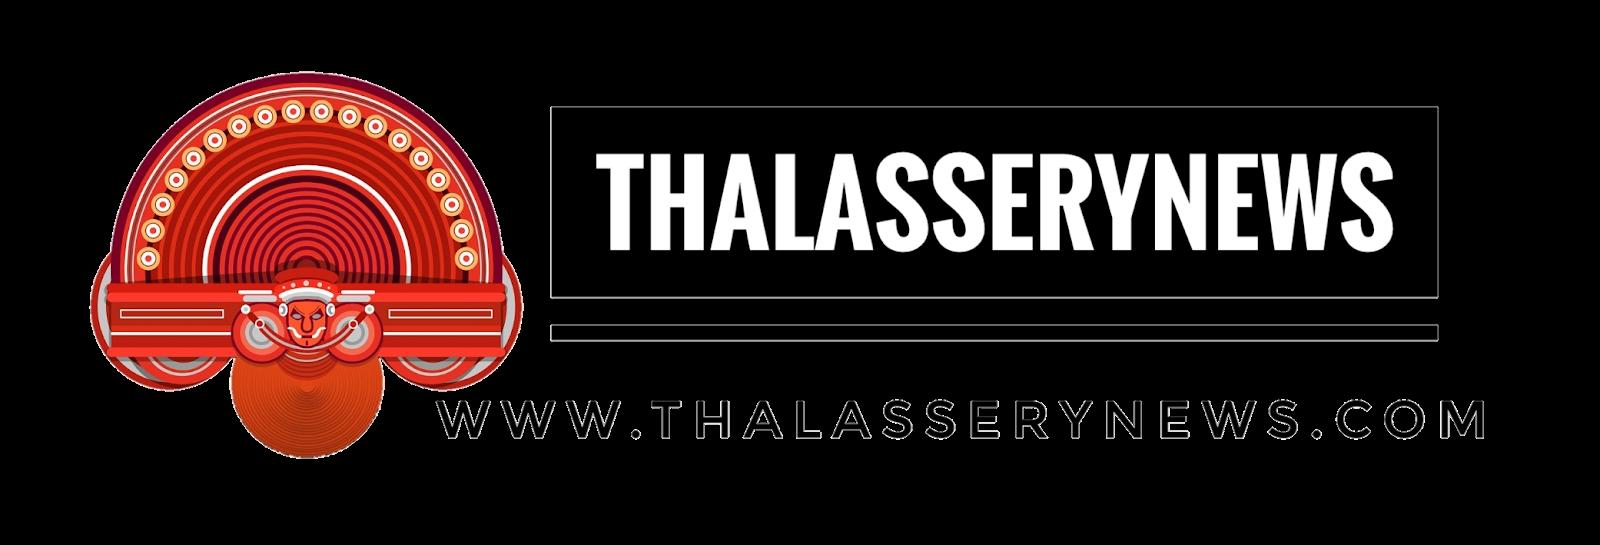 Thalassery News